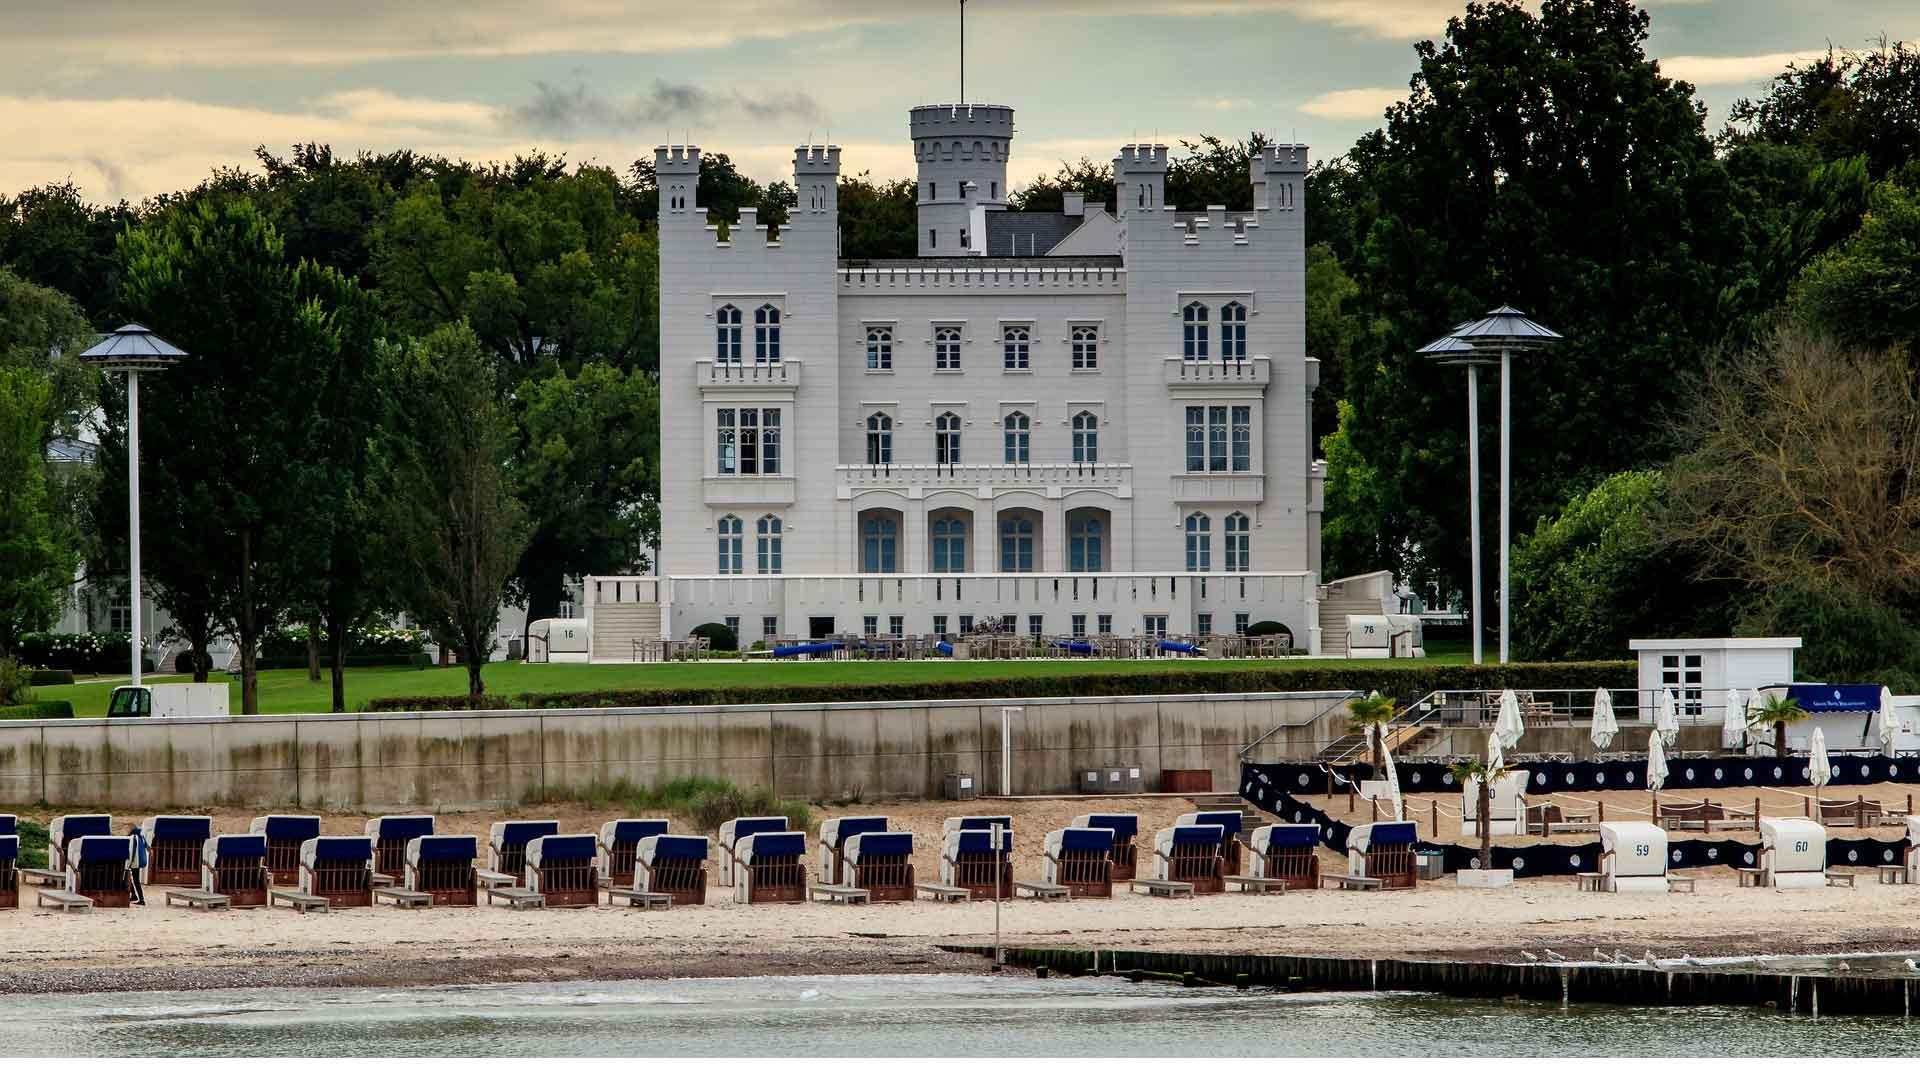 Schitterende architectuur langs de kust in Heiligendamm op Usedom.